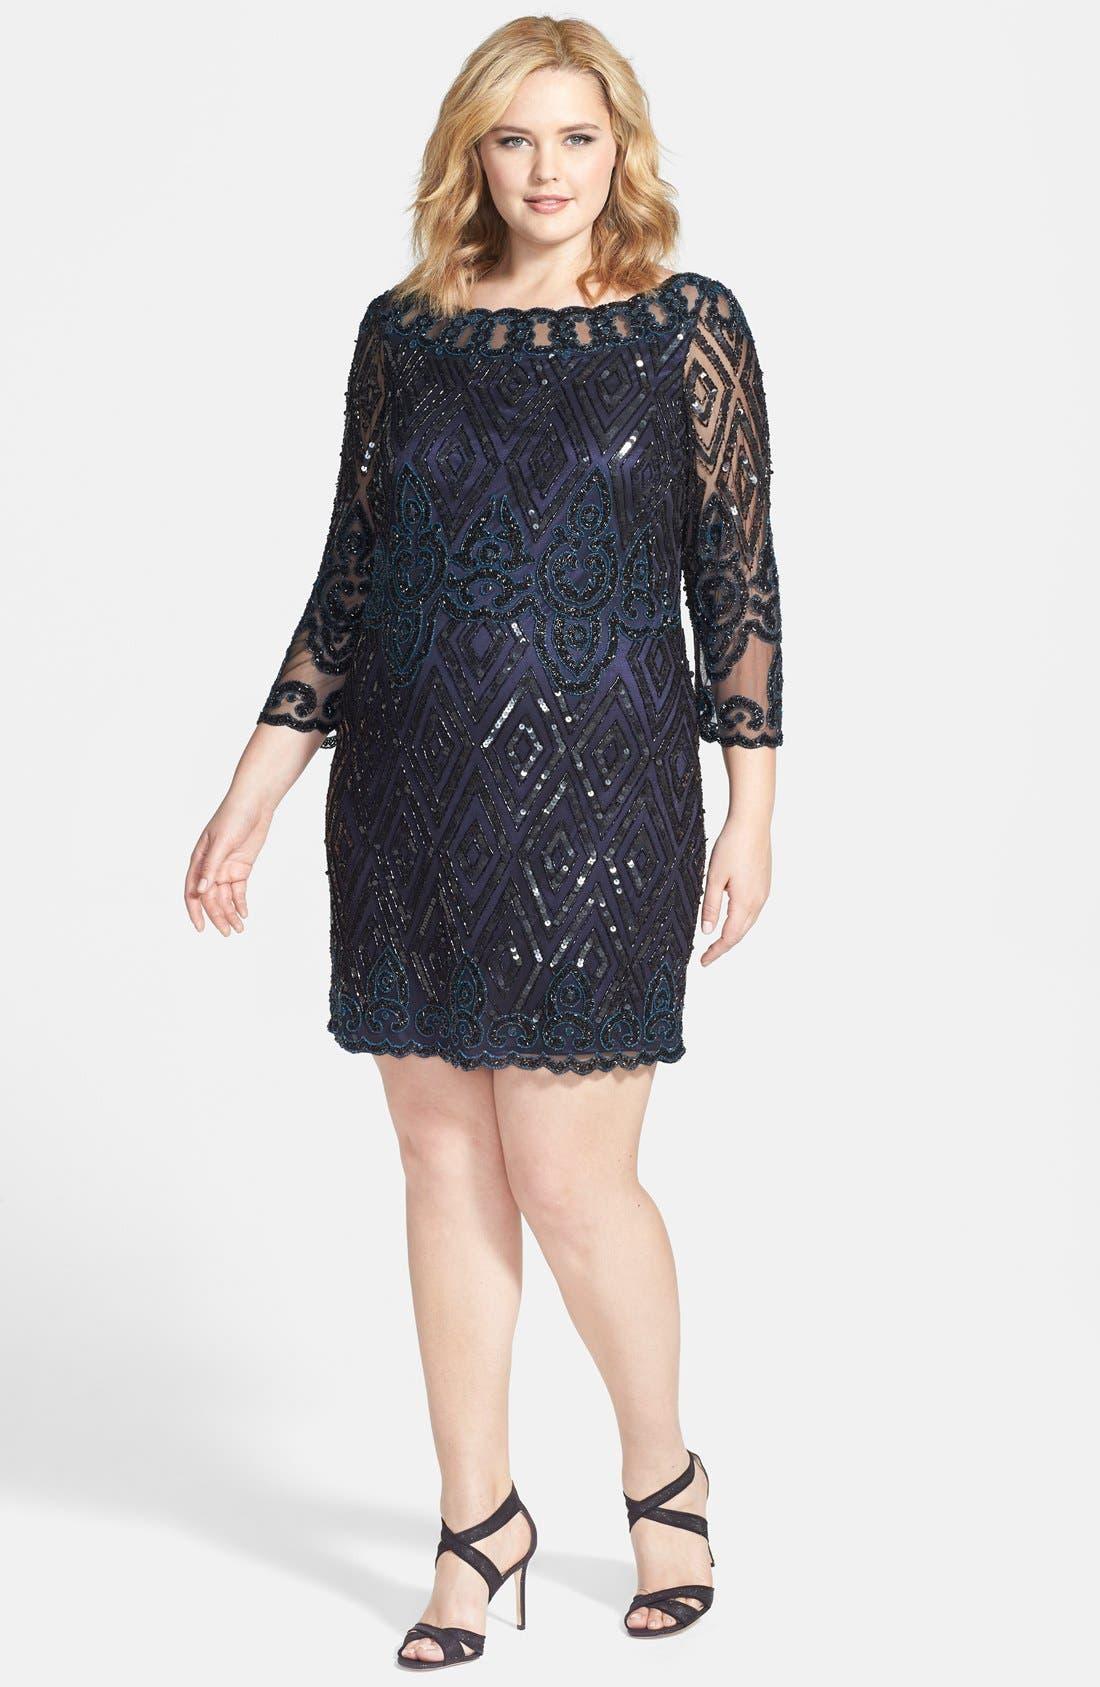 Main Image - Pisarro Nights Embellished Short Cocktail Dress (Plus Size)